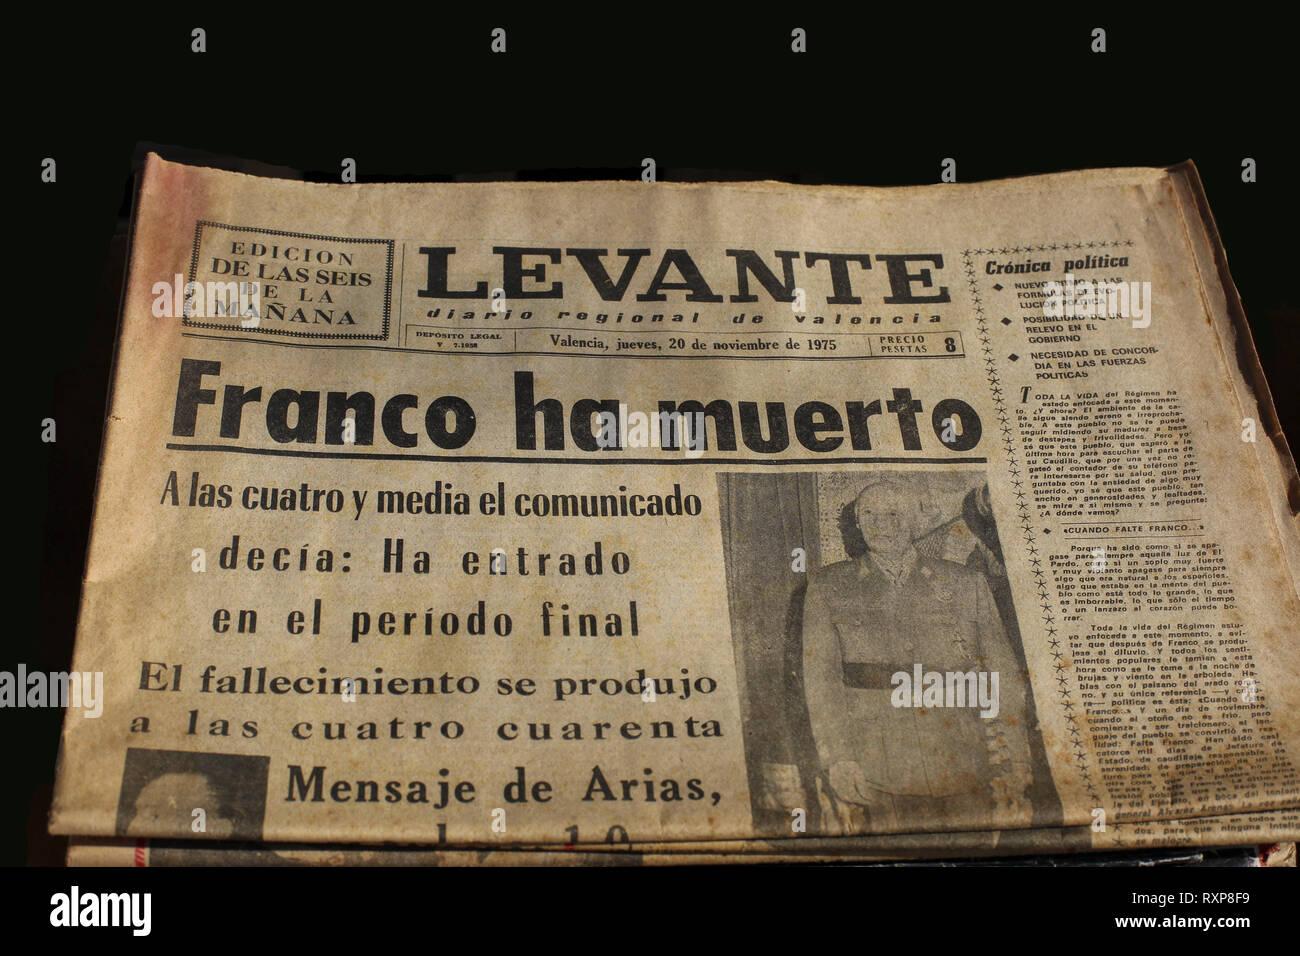 Old Spanish newspaper of 1975 with headline saying 'Franco